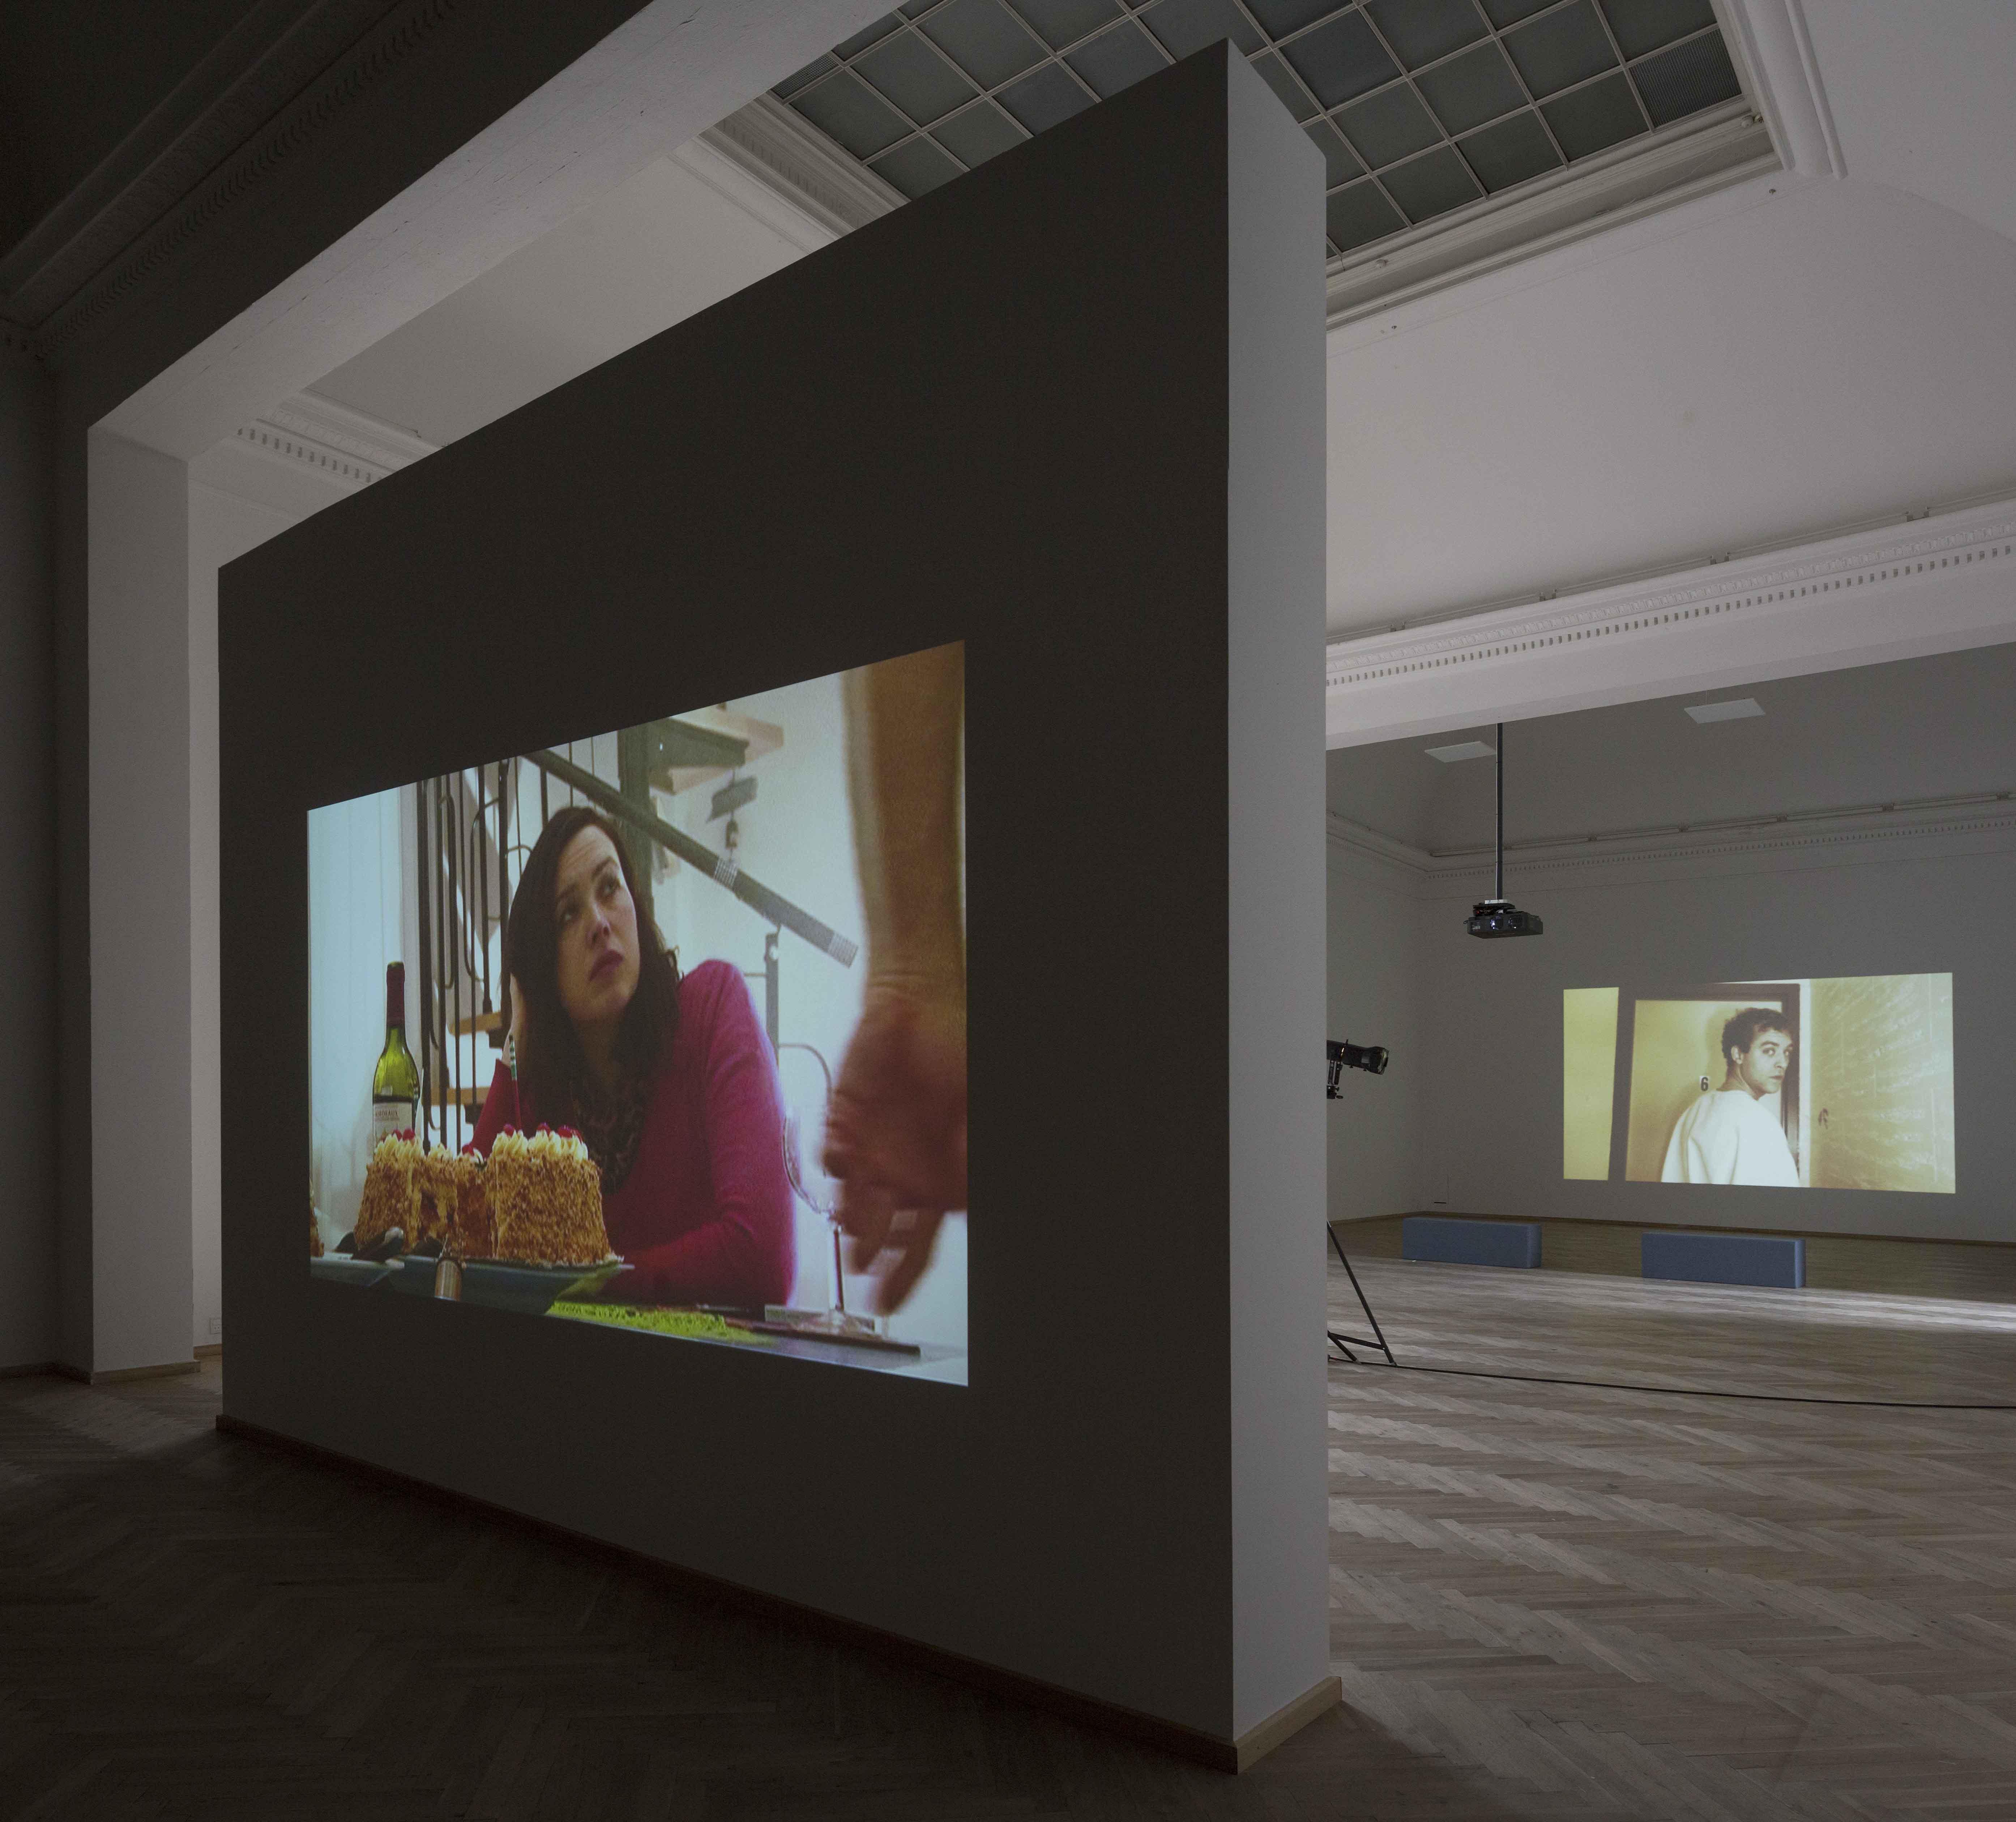 installationsfoto fra Keren Cytter udstilling. fotograf: Anders Sune Berg